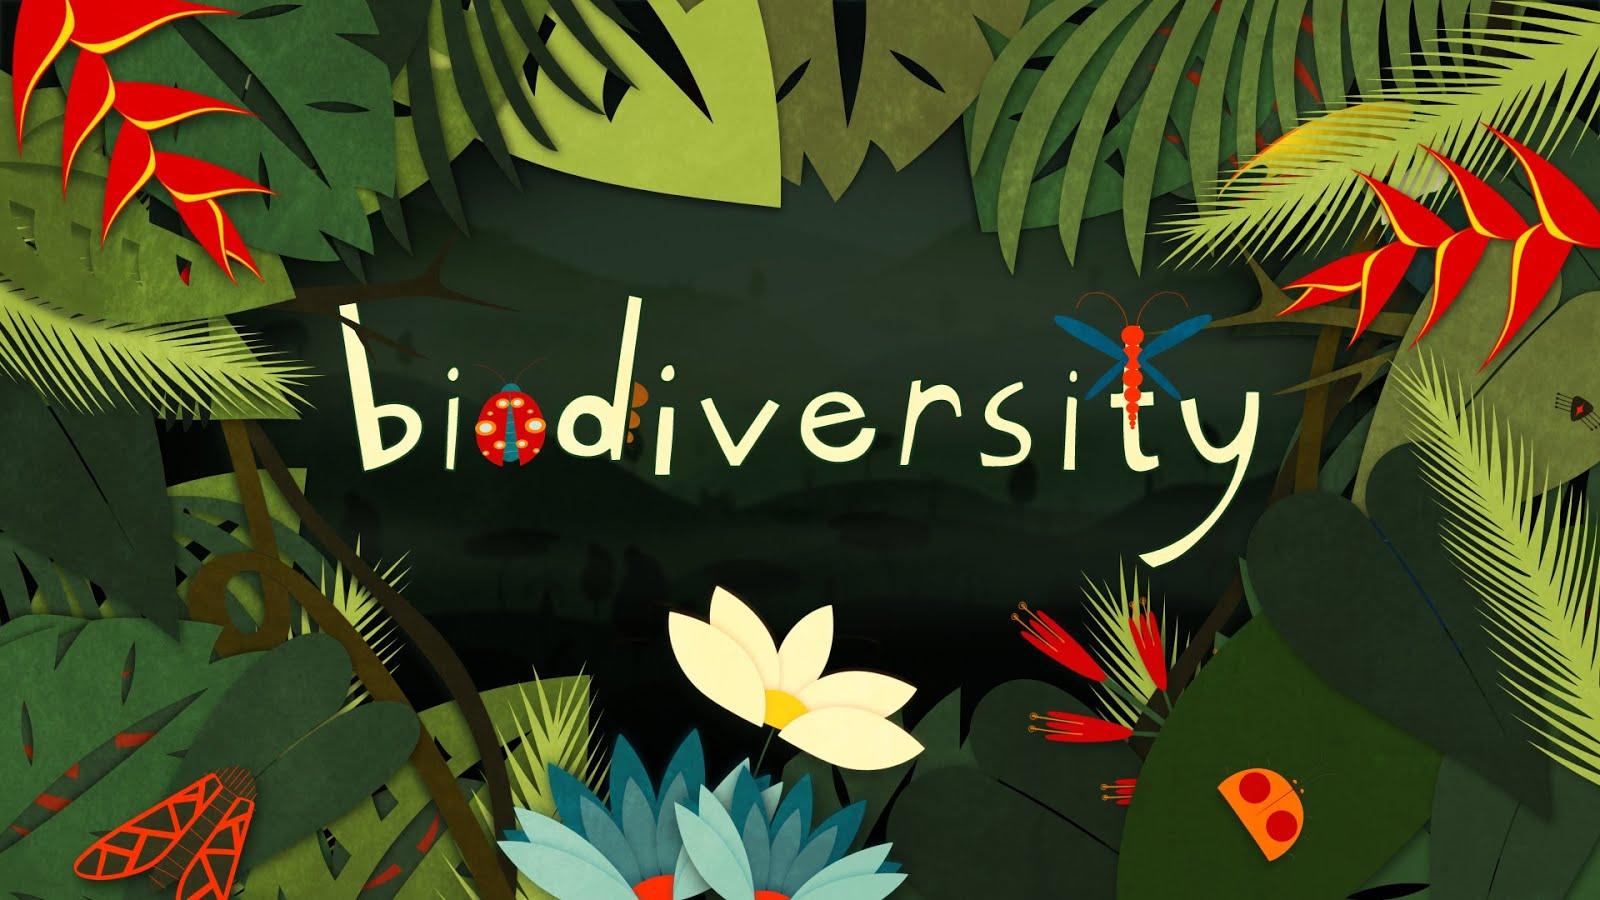 145 Biodiversity